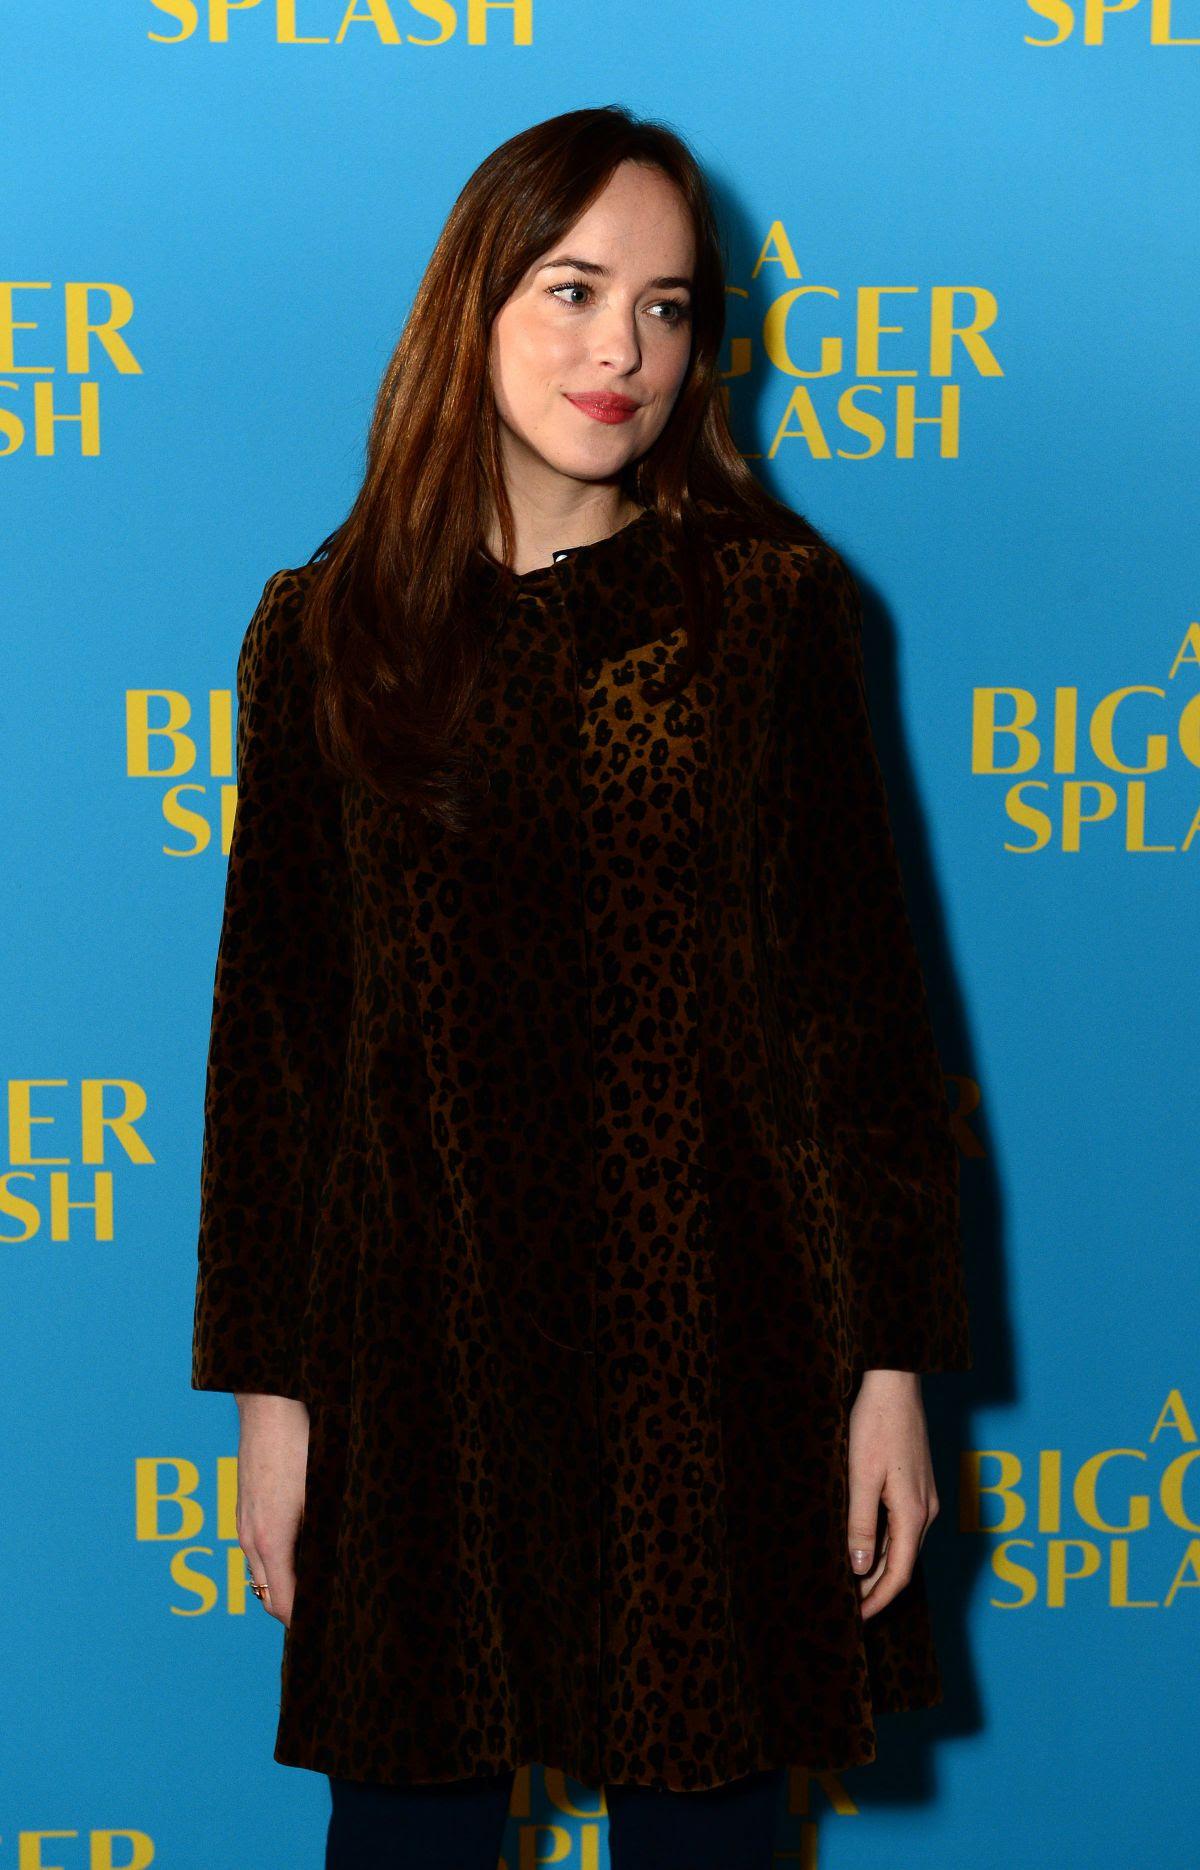 DAKOTA JOHNSON at Bigger Splash Photocall in London 02/07/2016